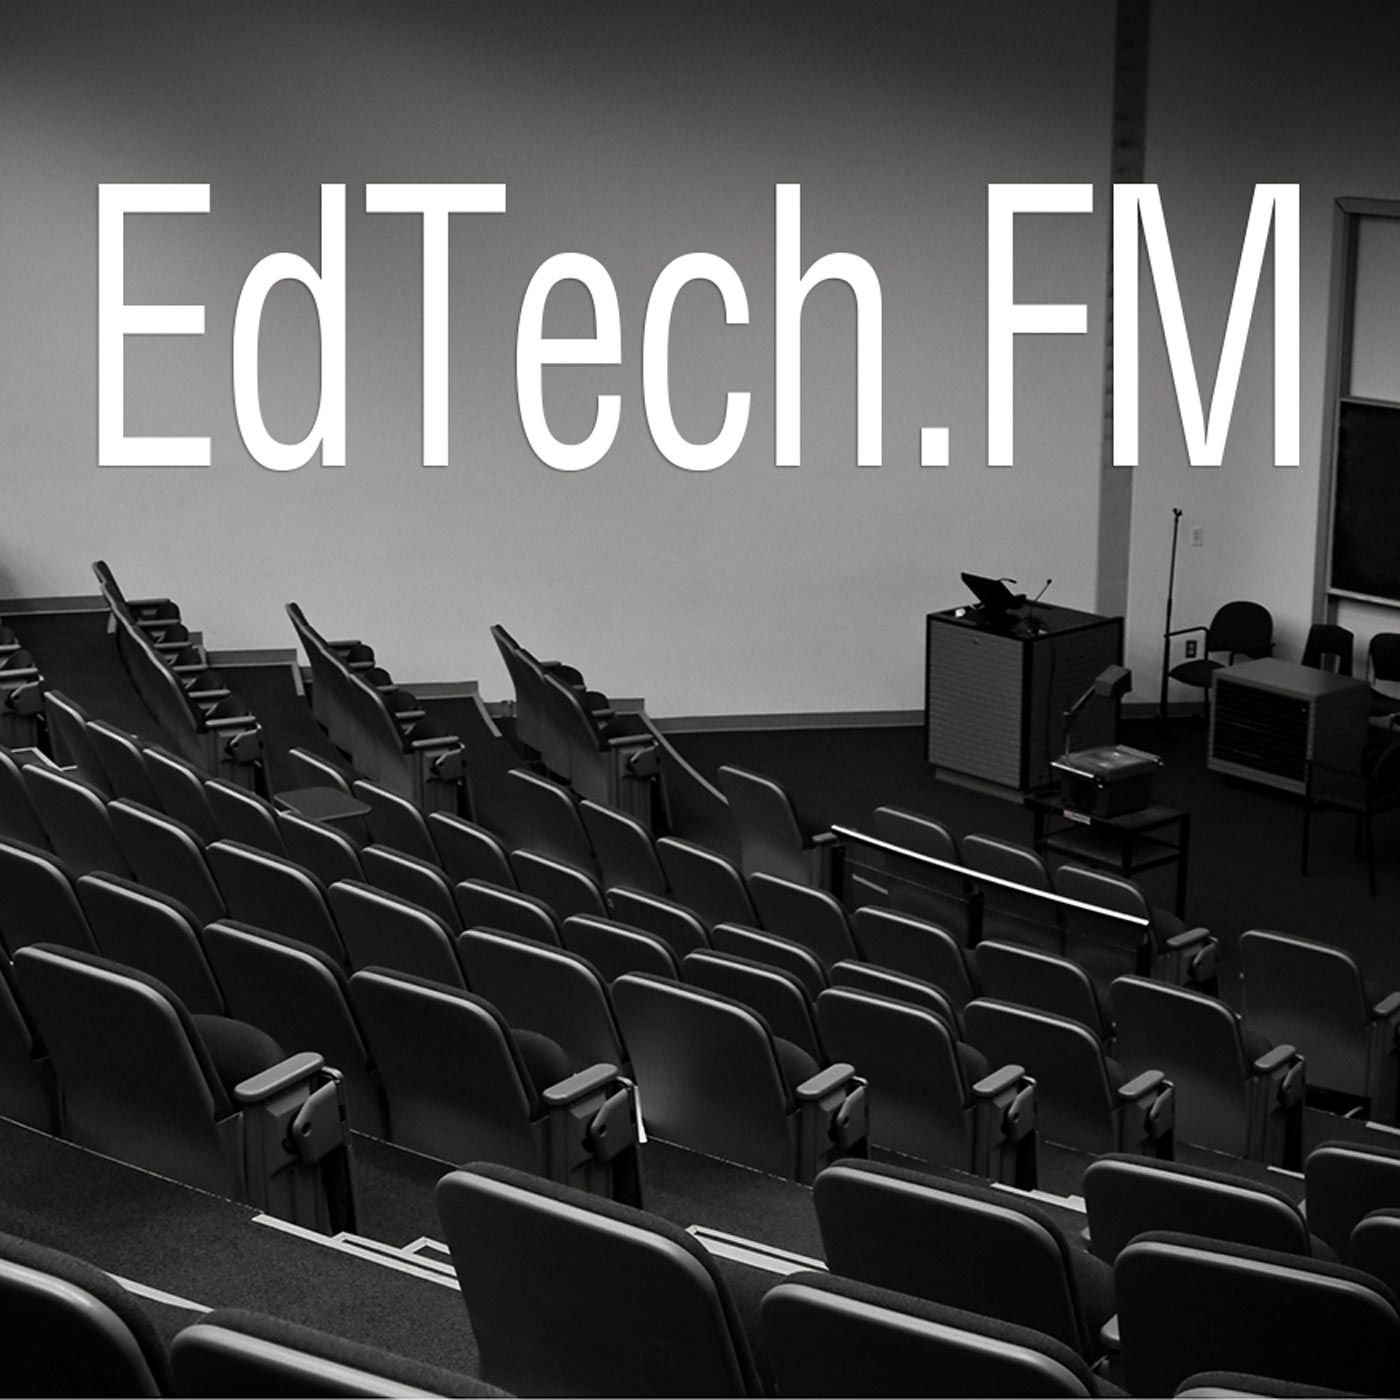 EdTech.FM